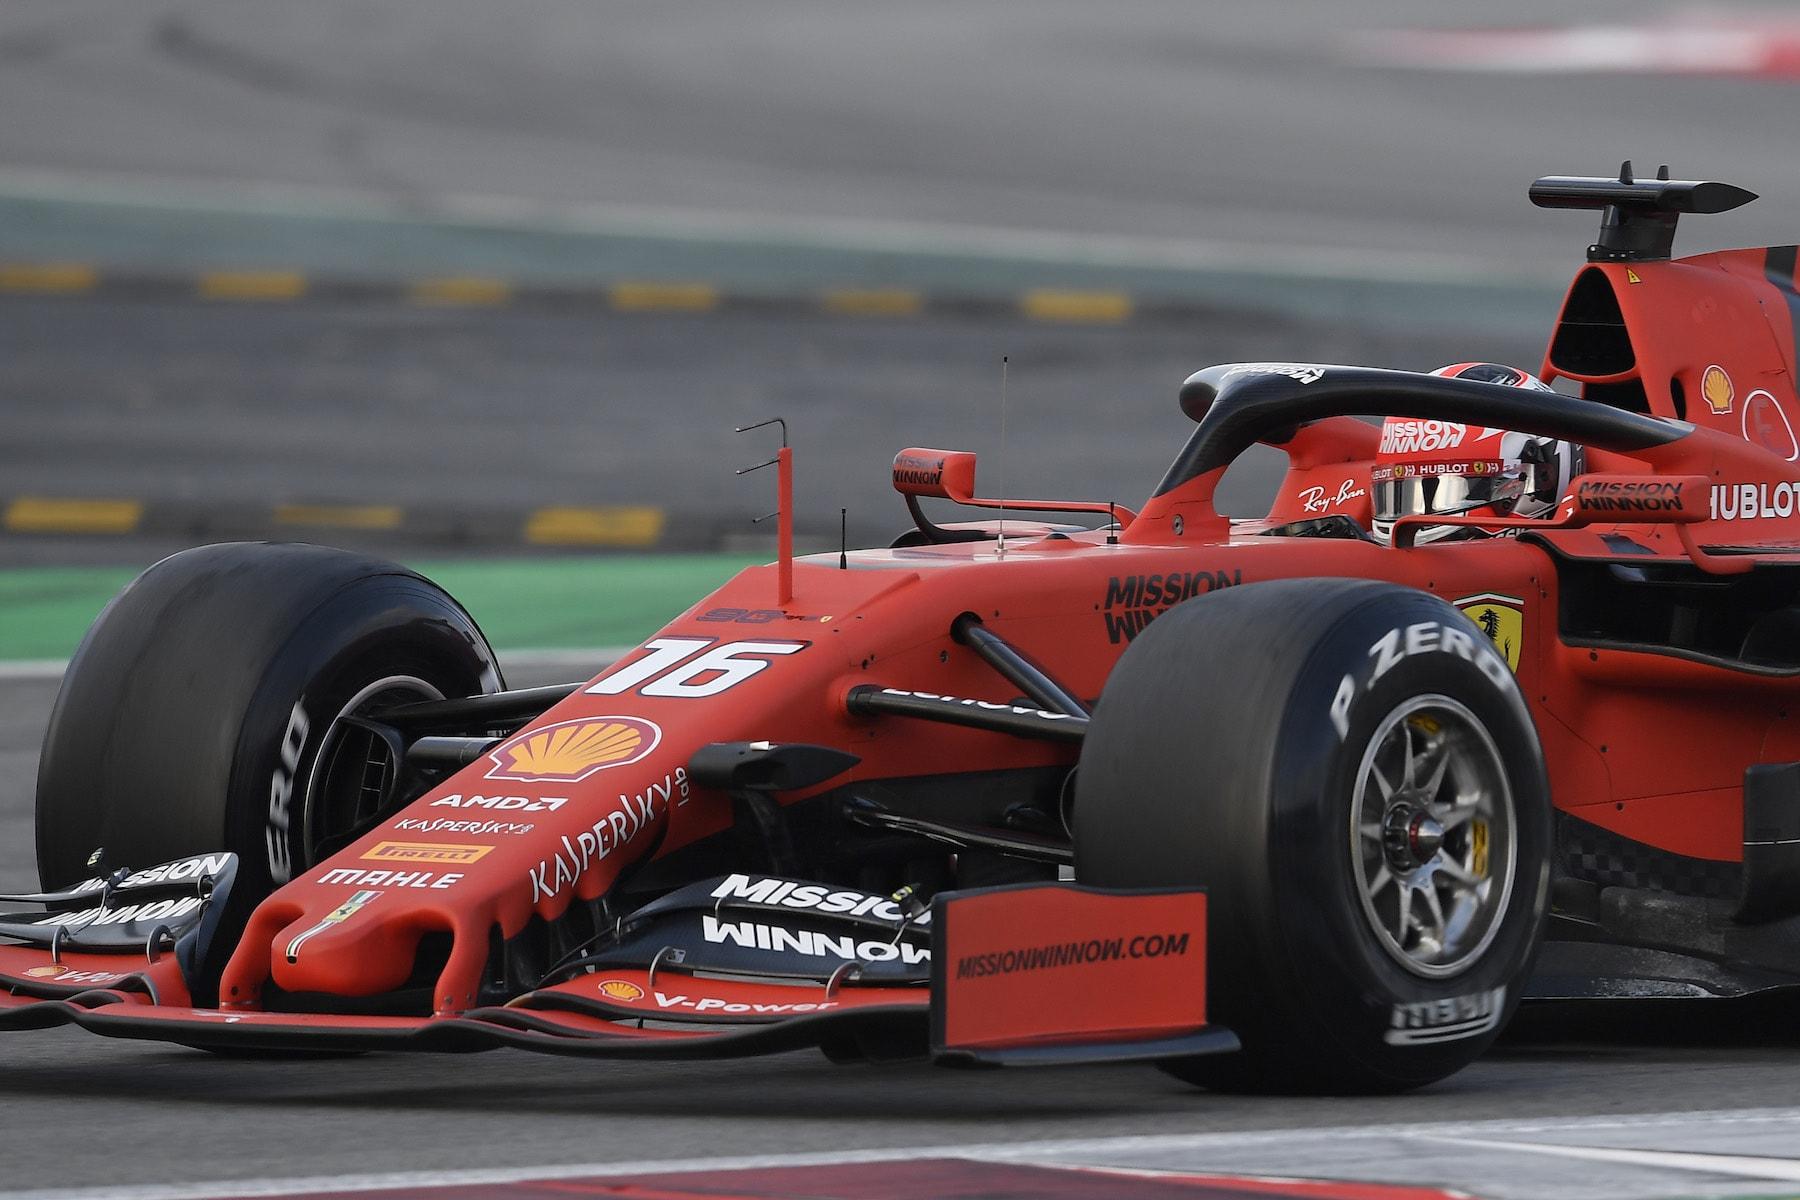 2019 Charles Leclerc   Ferrari SF90   2019 Barcelona T1 D2 3 copy.jpg